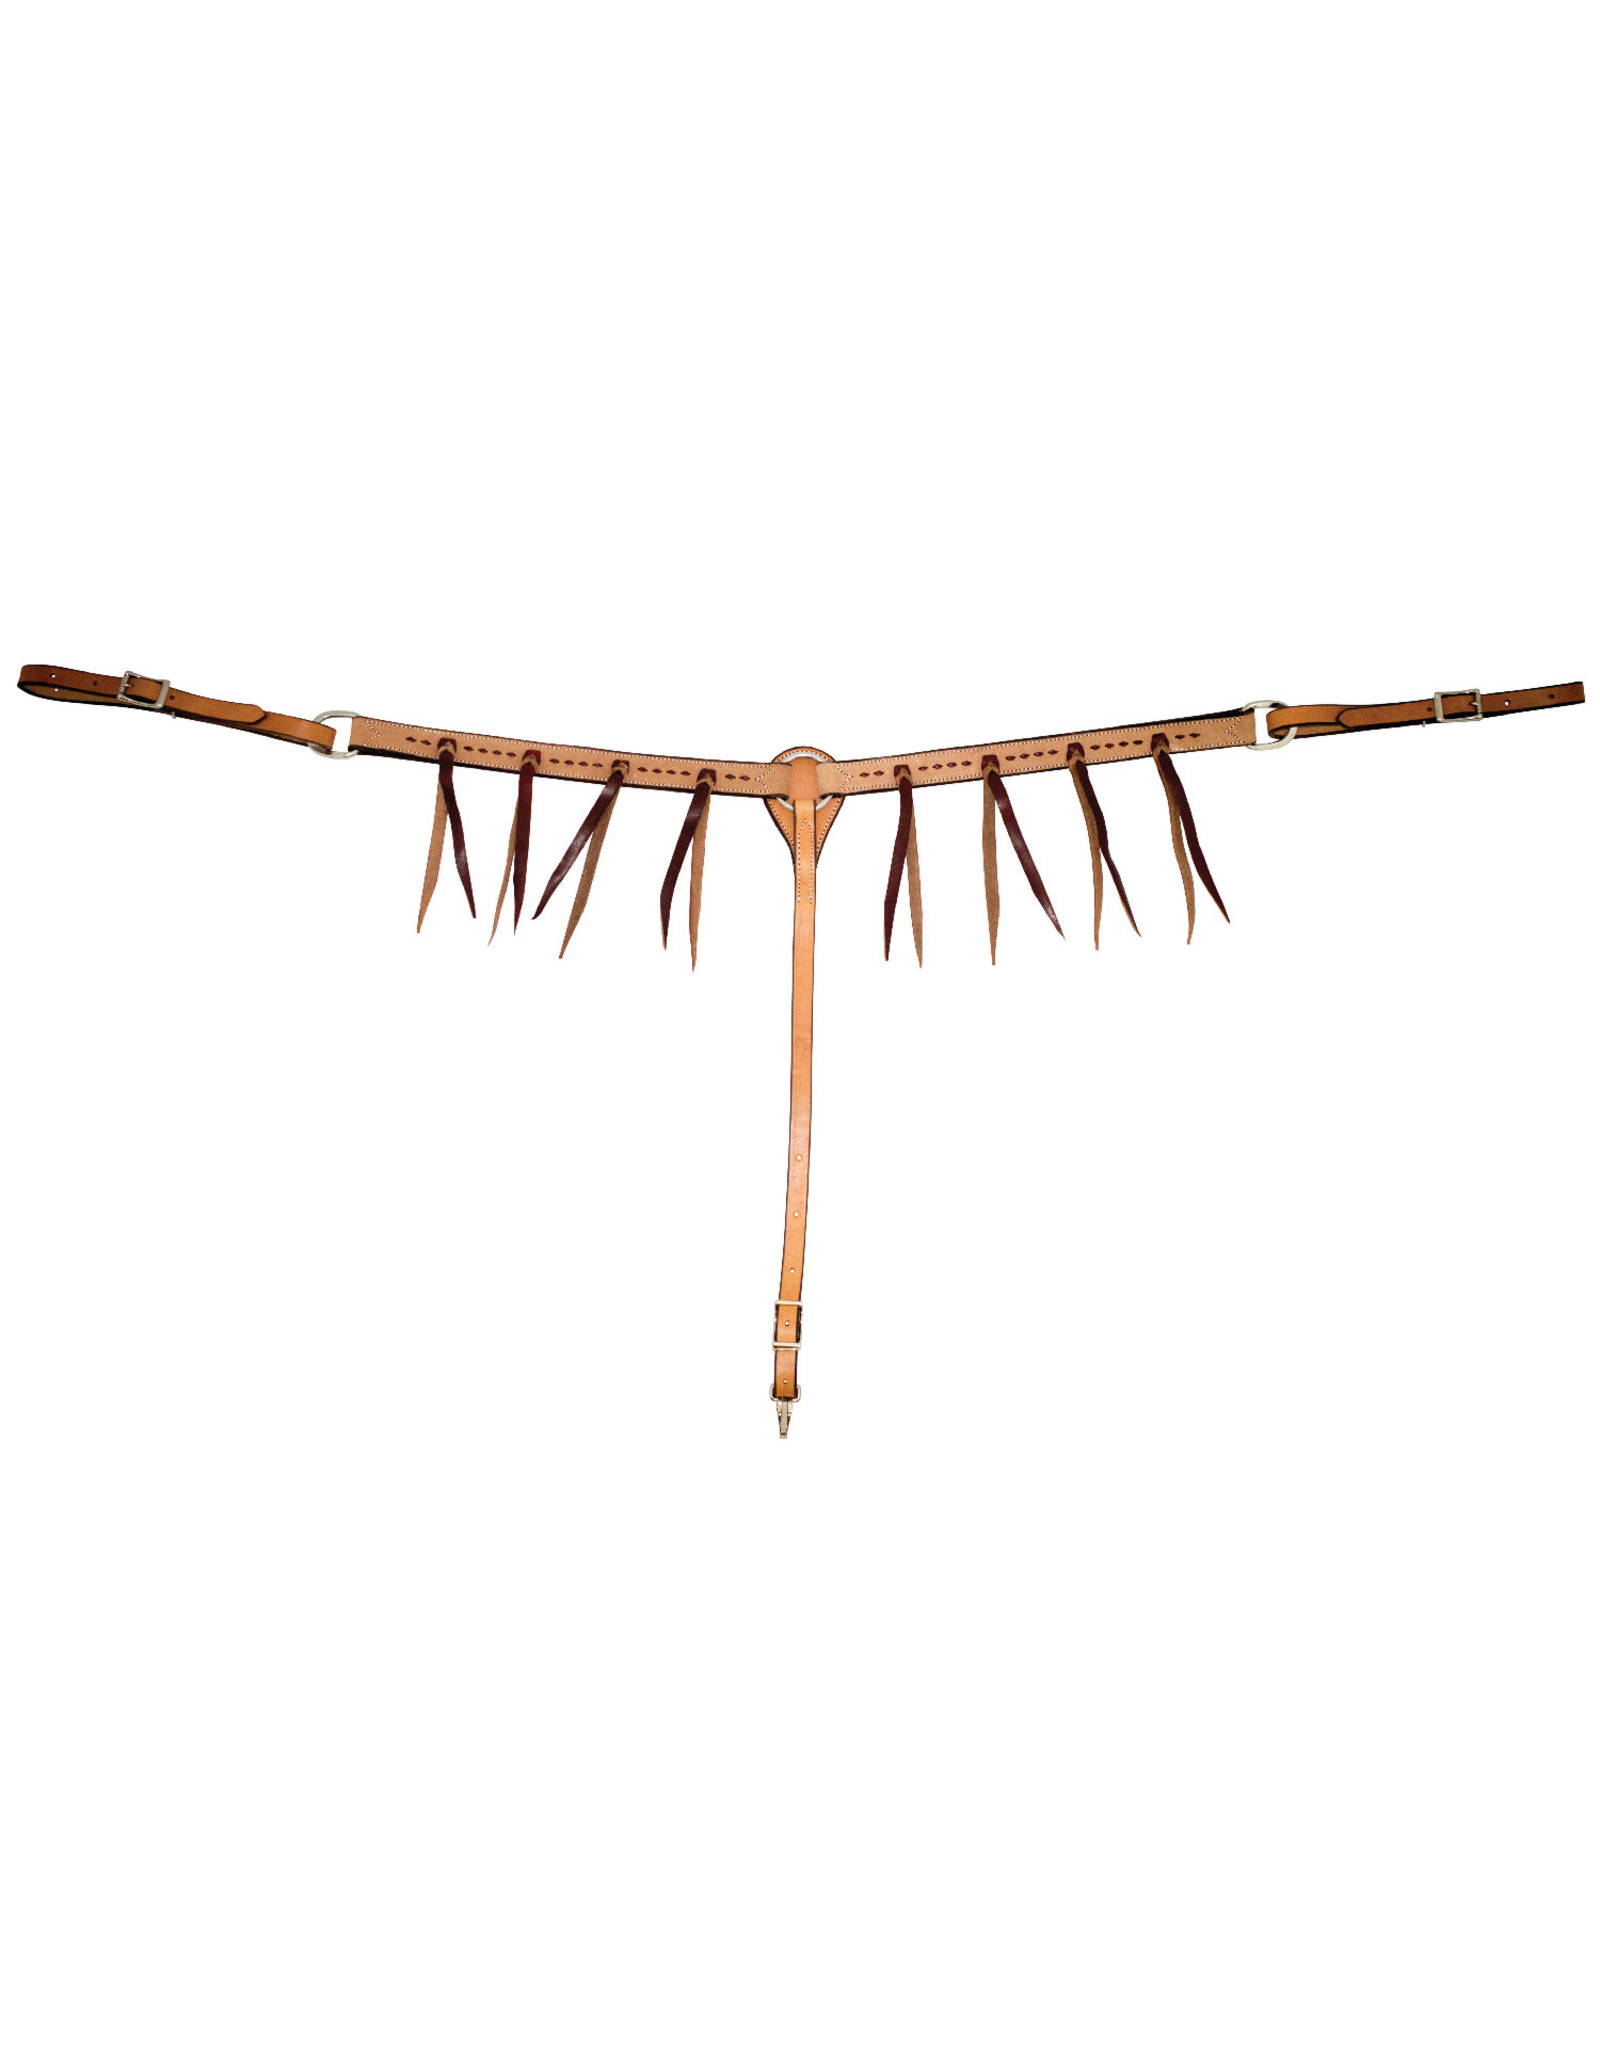 Partrade Breast Collar Golden RO Buckstitch Latigo Strings